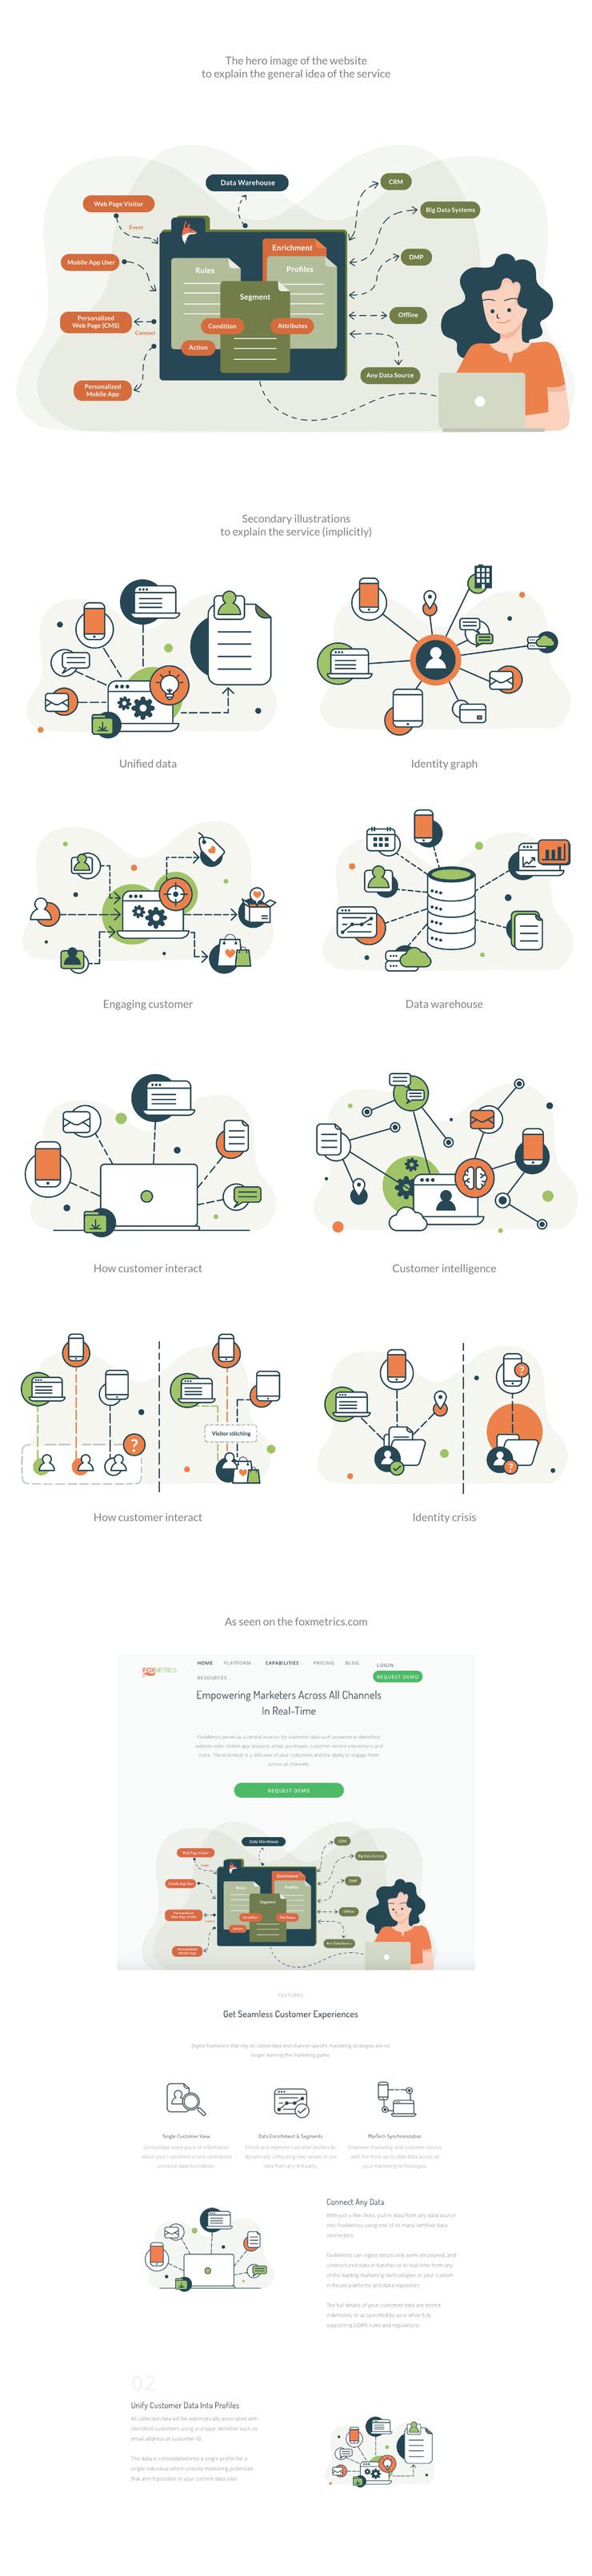 FoxMetrics Illustration Set for the Website